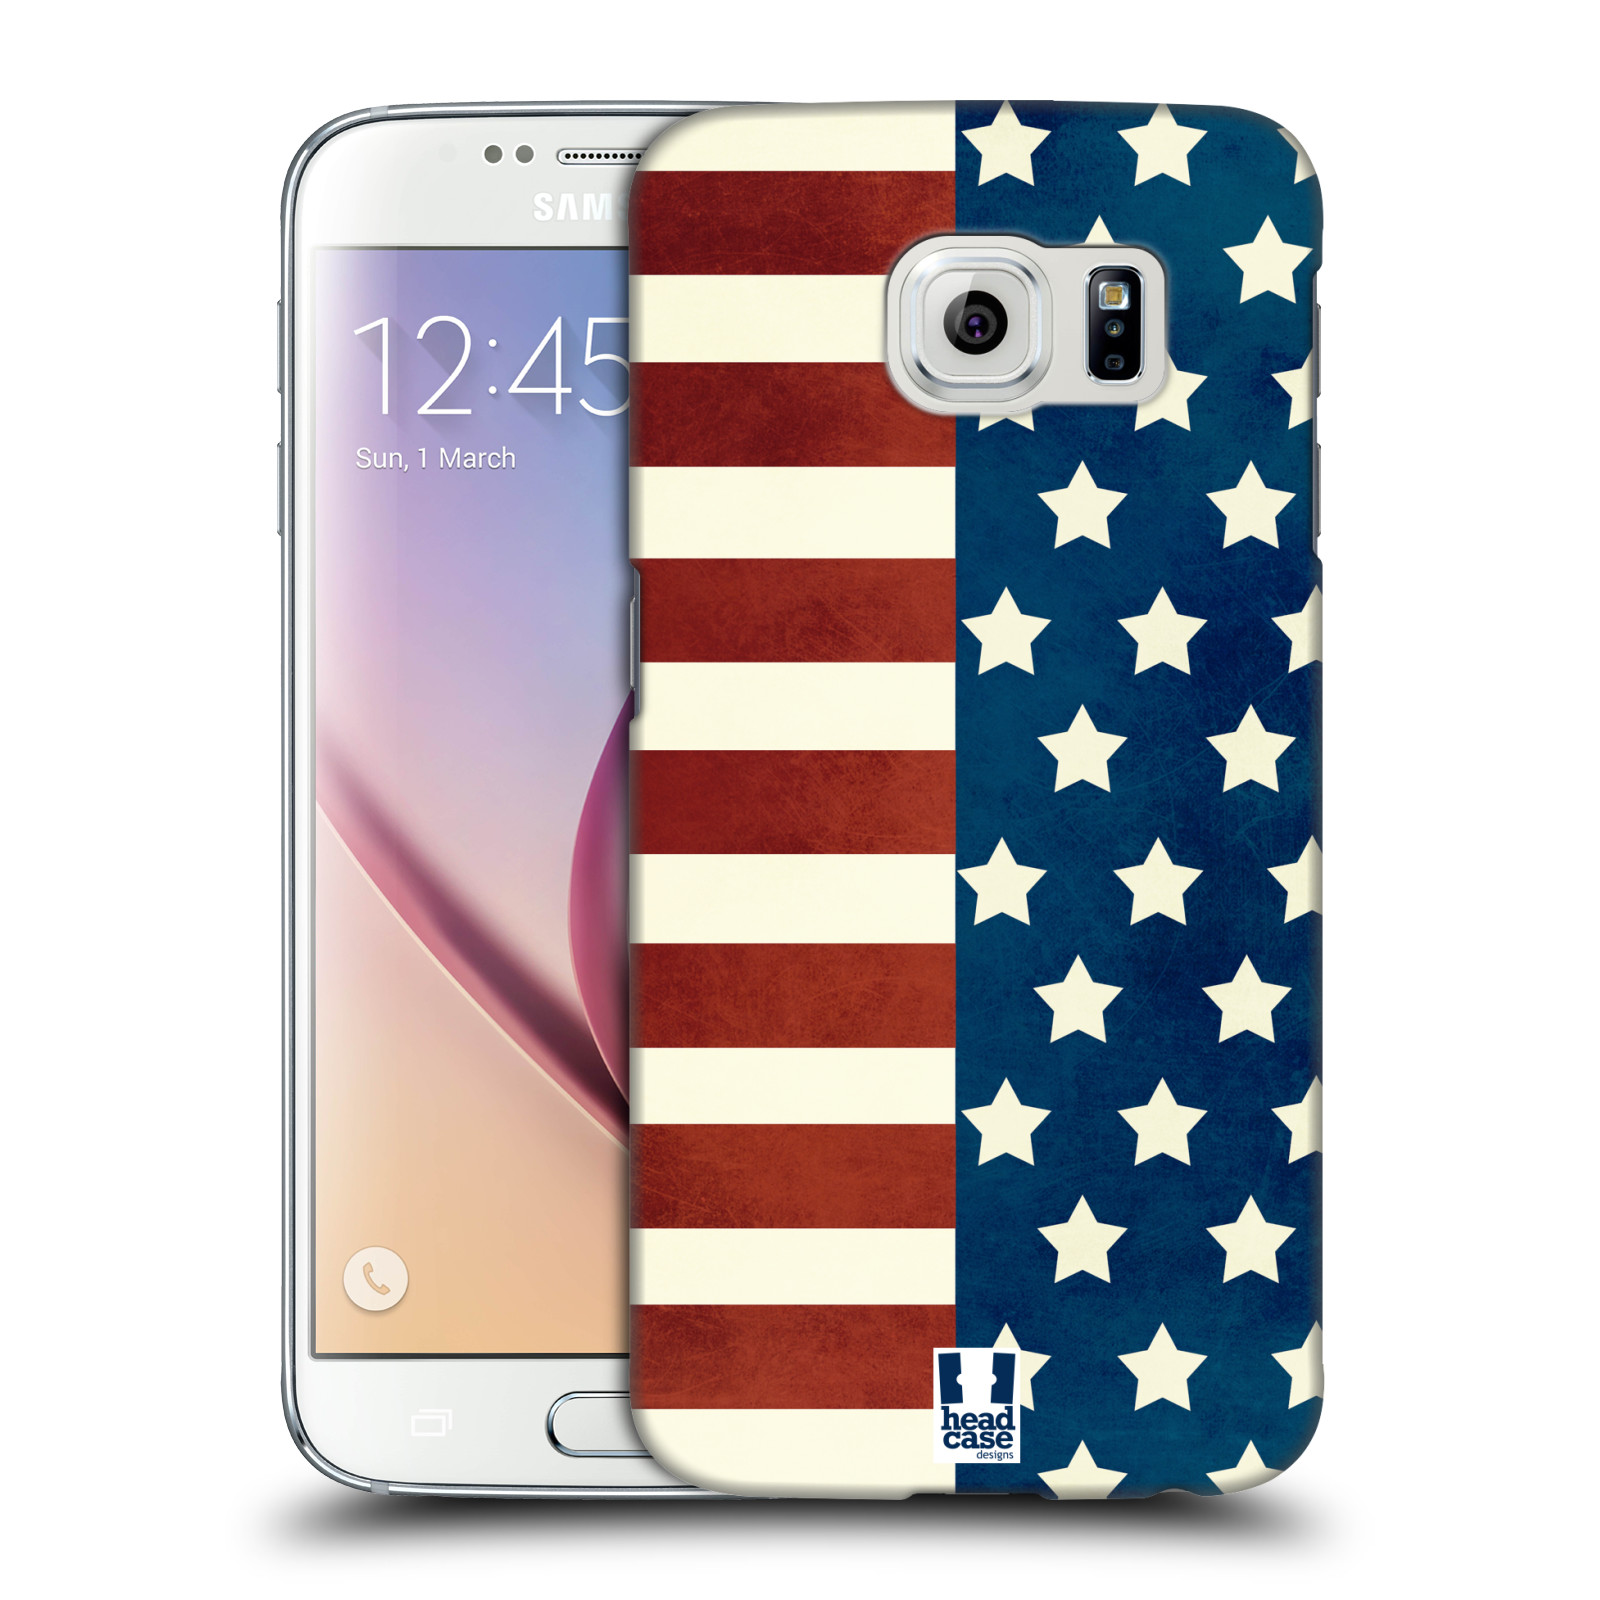 HEAD CASE plastový obal na mobil SAMSUNG Galaxy S6 (G9200, G920F) vzor USA VLAJKA HVĚZDY A PRUHY